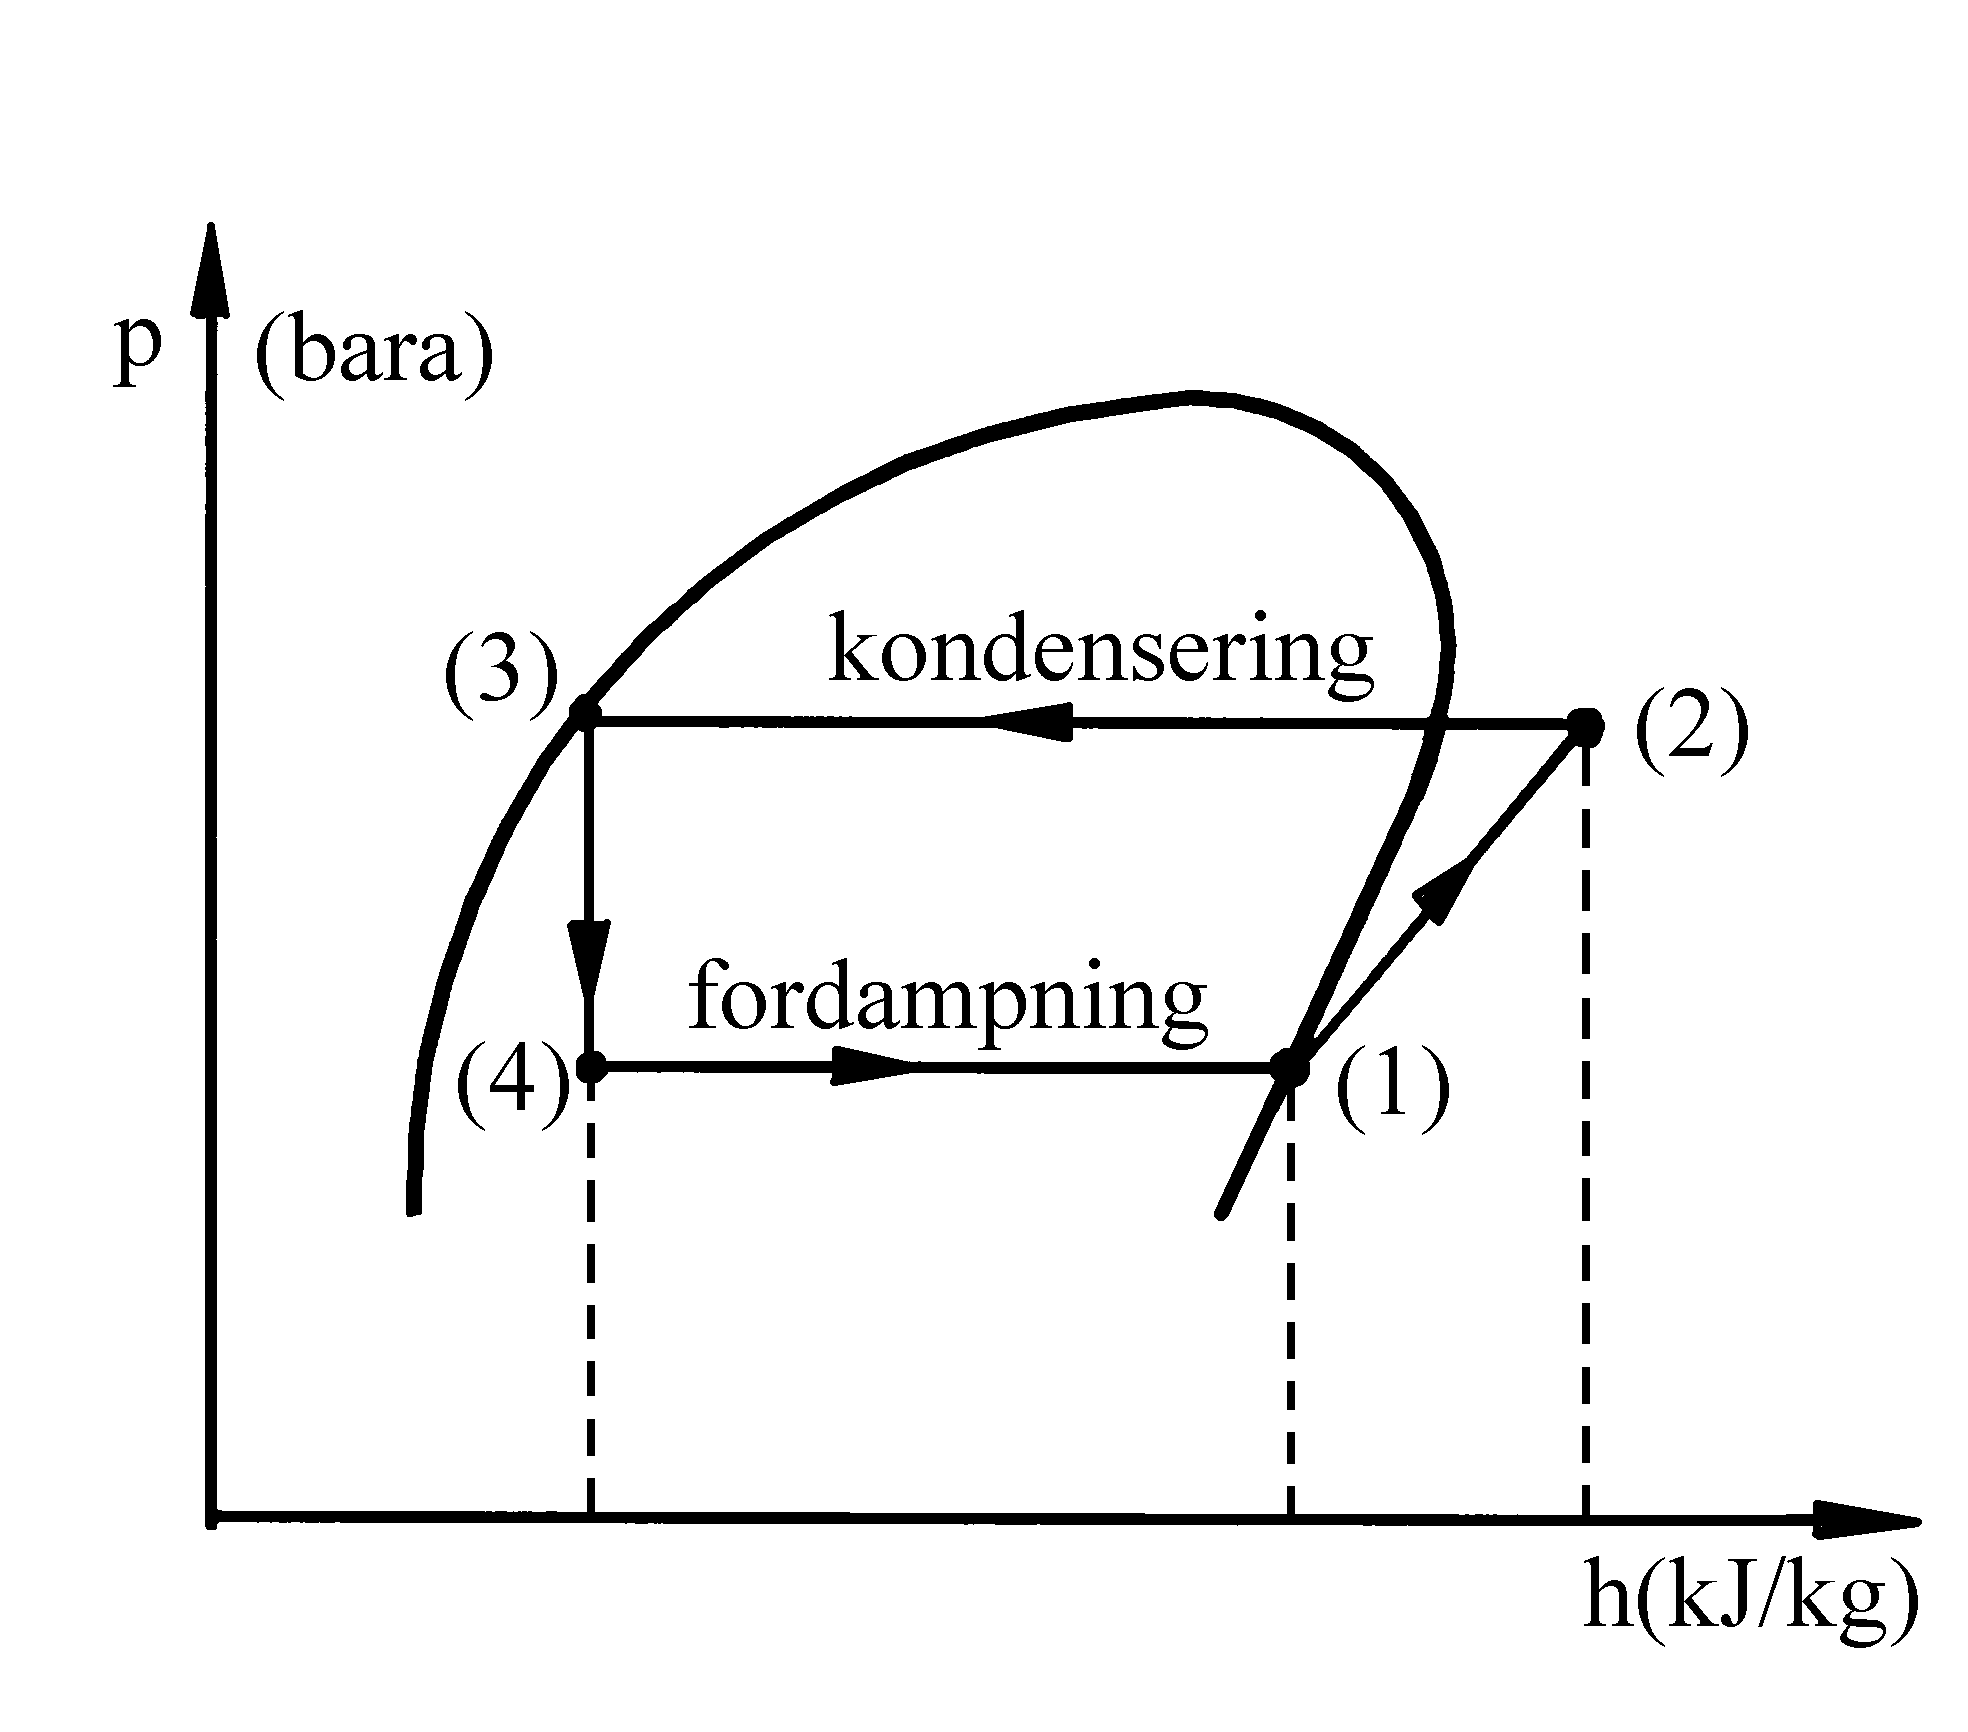 image162.png